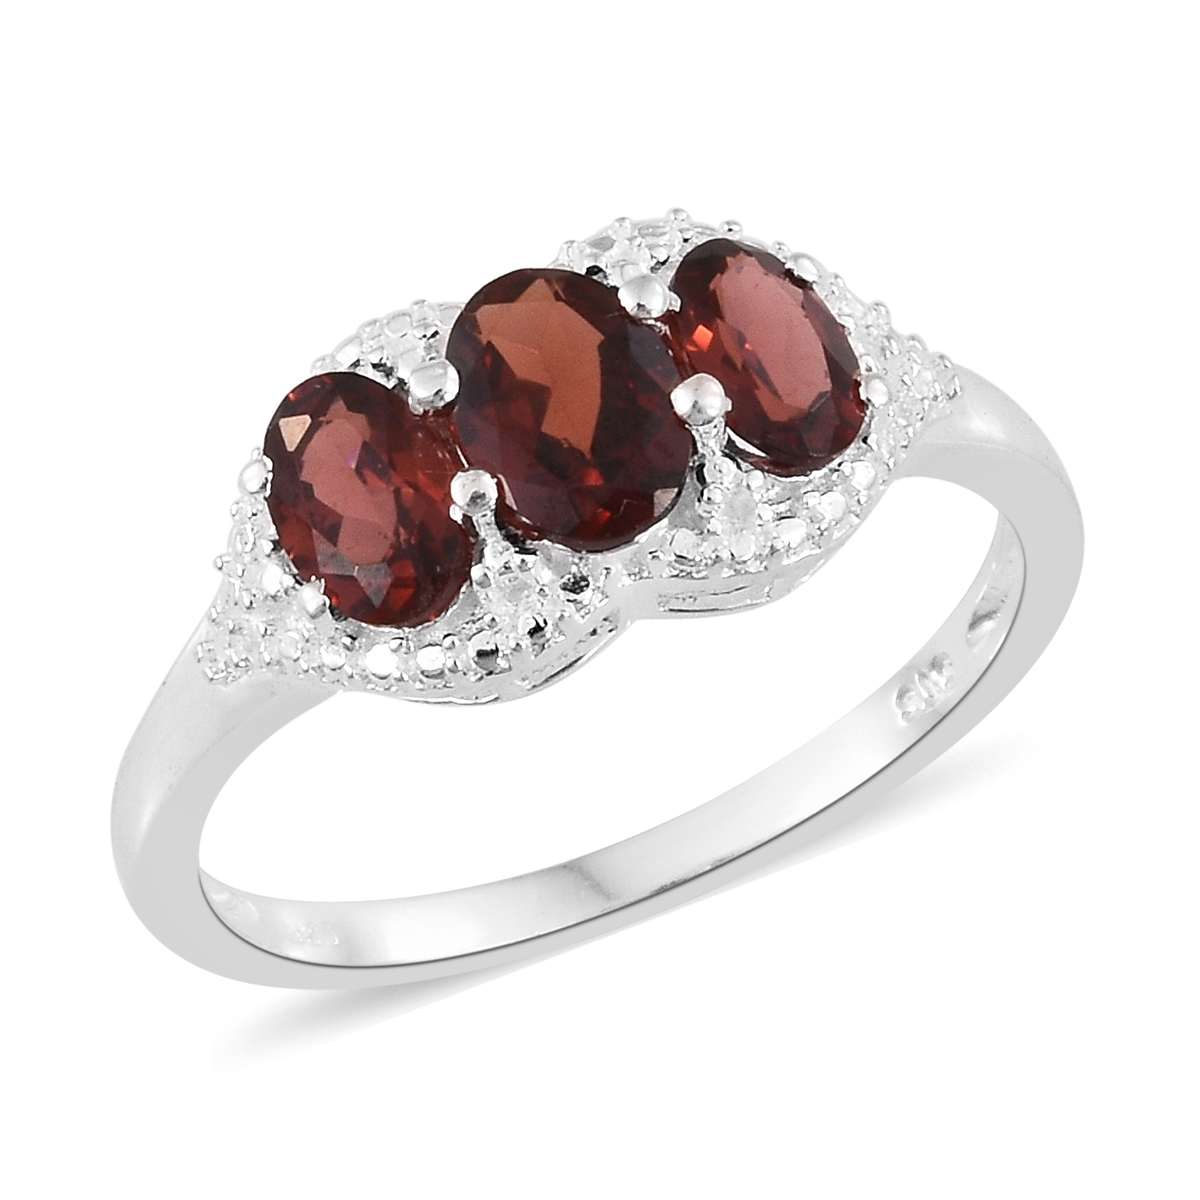 Garnet Bands: 925 Sterling Silver 2 Cttw Oval Garnet 3 Stone Gift Ring